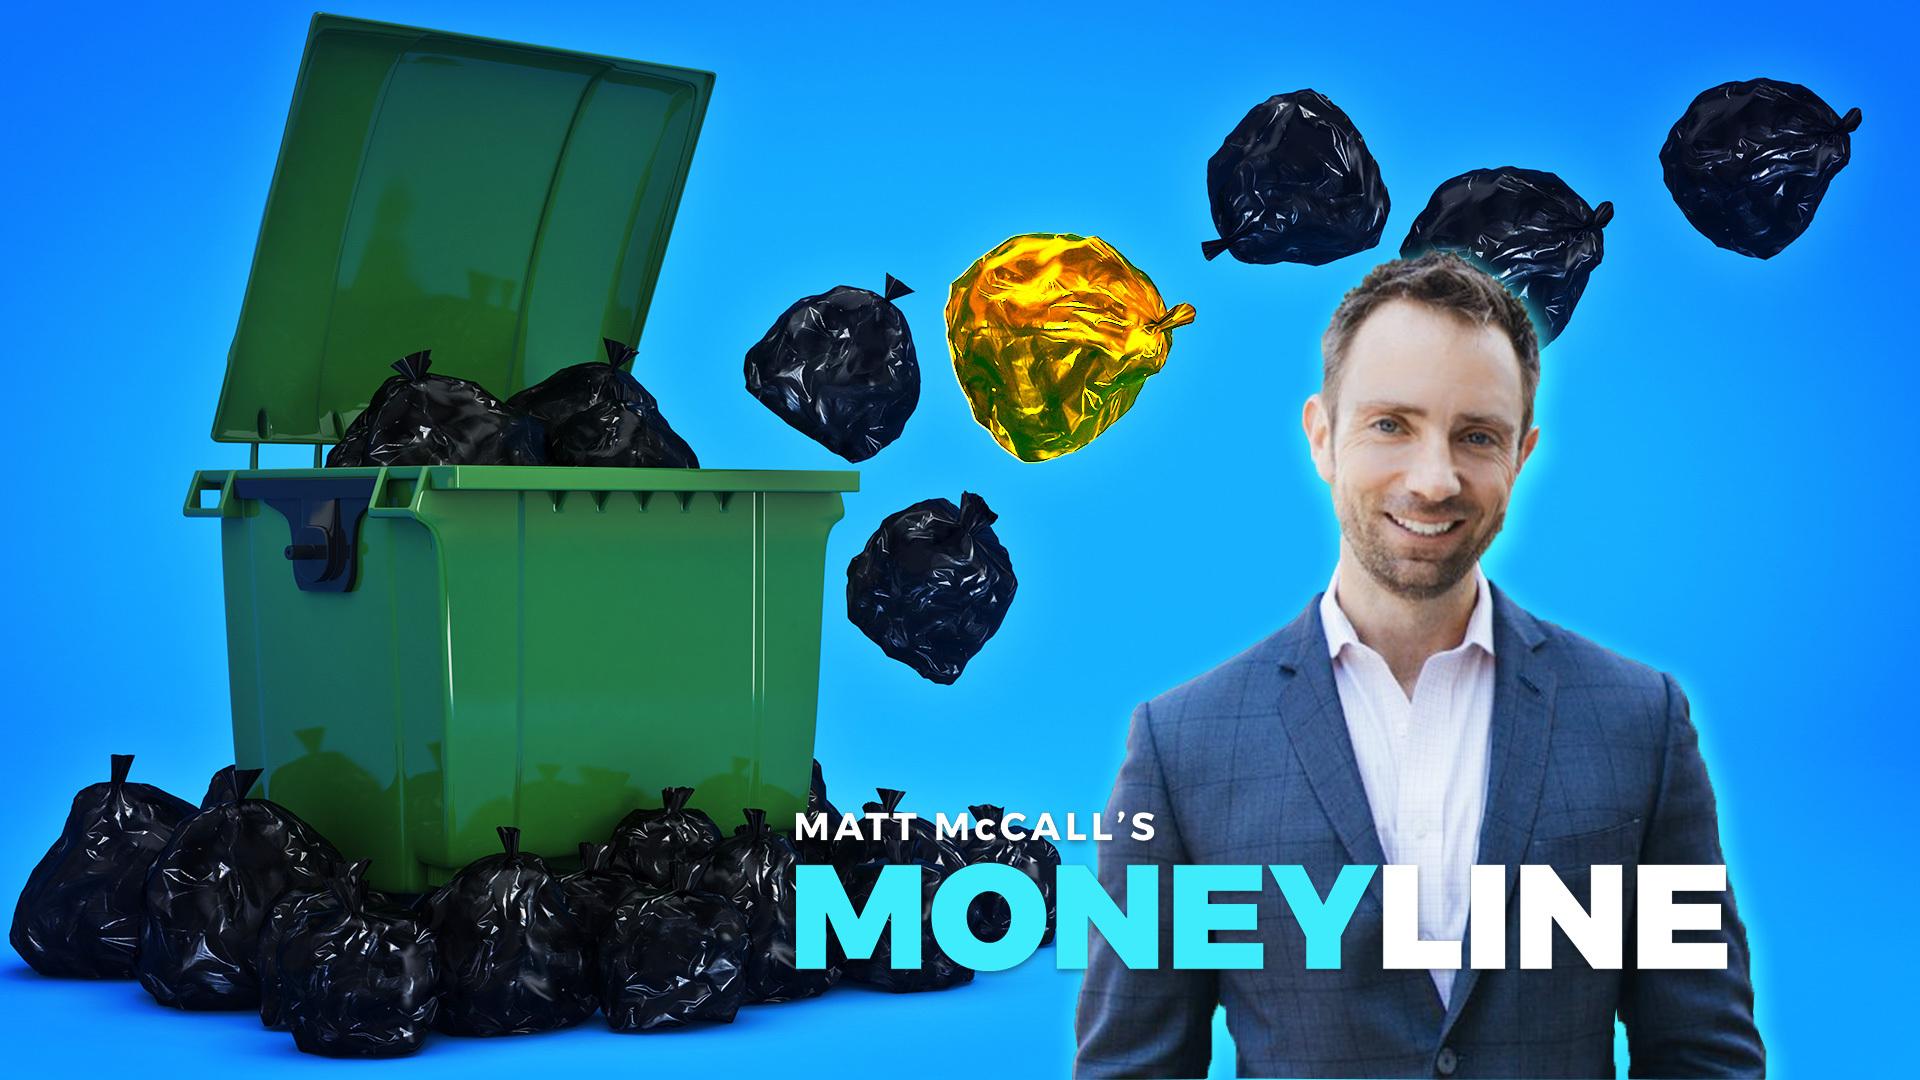 Matt McCall's Moneyline: Dumpster Diving for SPACs to Buy Now